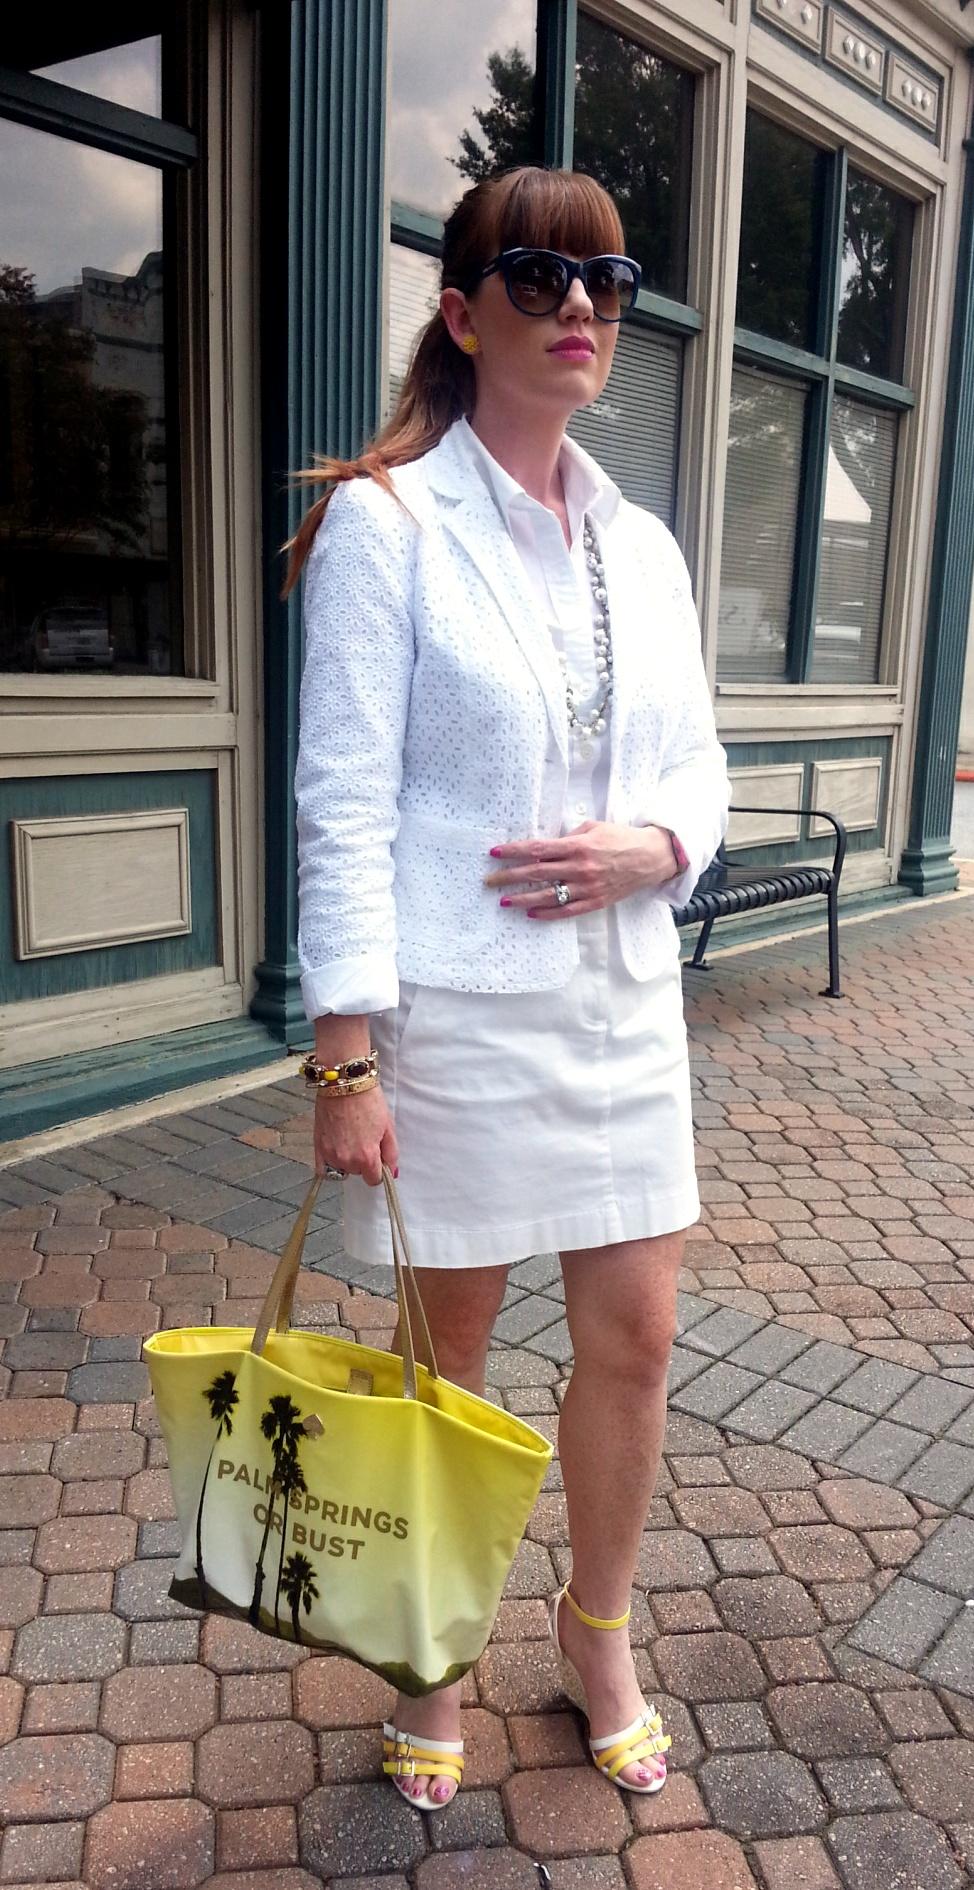 Jacket: Cynthia Rowley Blouse: Gap Skirt: JCREW Shoes: Madison @ShoeDazzle.com Necklace: Chloe+Isobel Earrings: Bealles Watch & Bag: Kate Spade NY